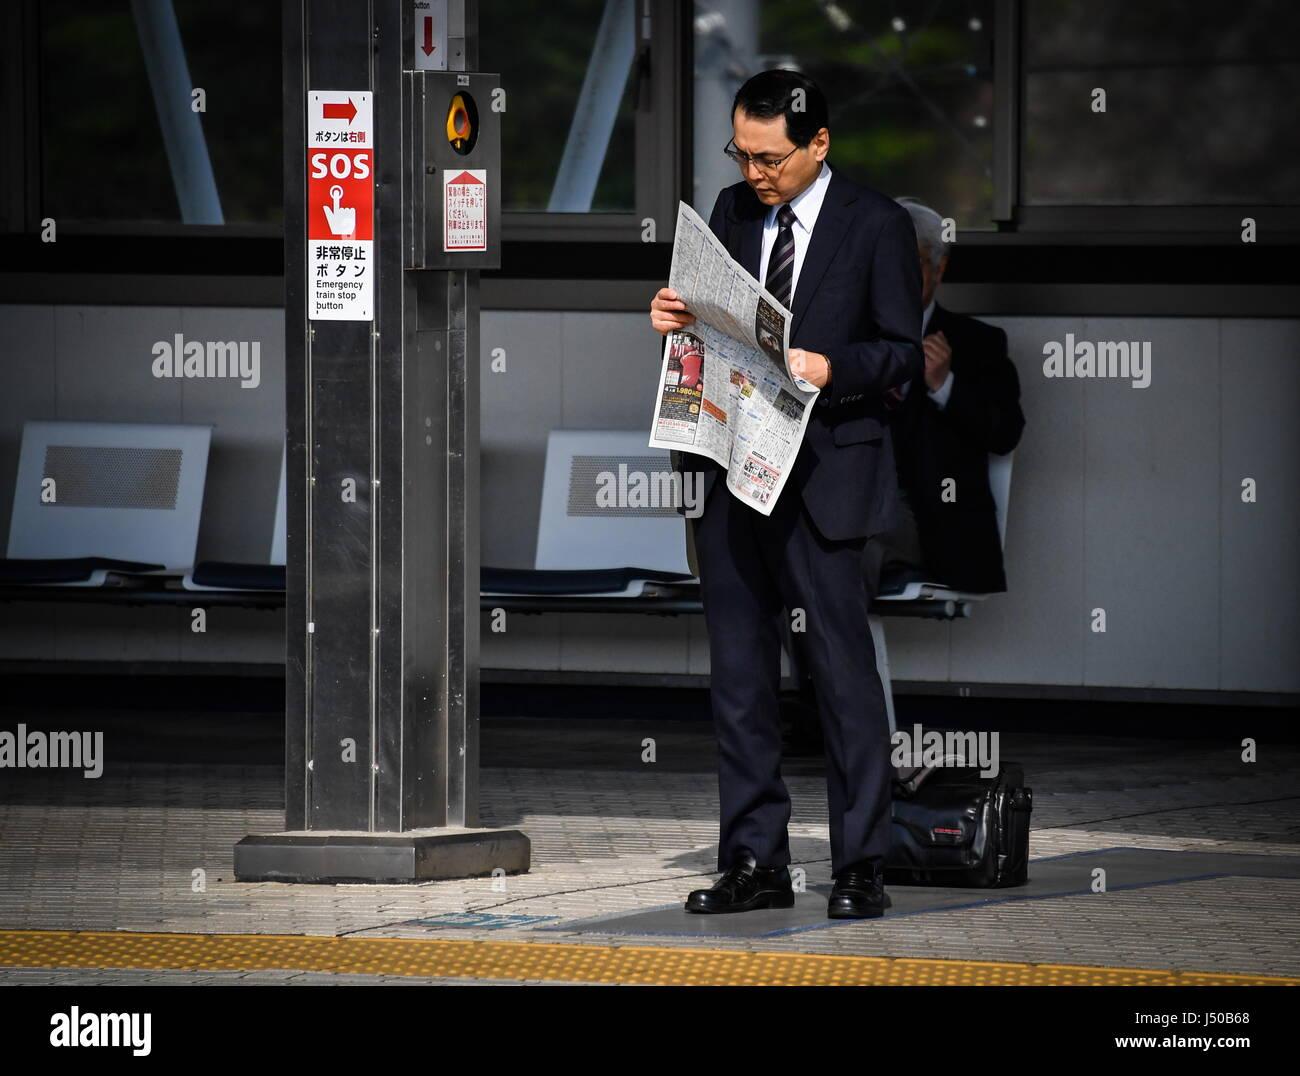 Odawara, Japan. 15th May, 2017. A passenger waiting for a Nozomi train of the Shinkansen high-speed railway lines - Stock Image